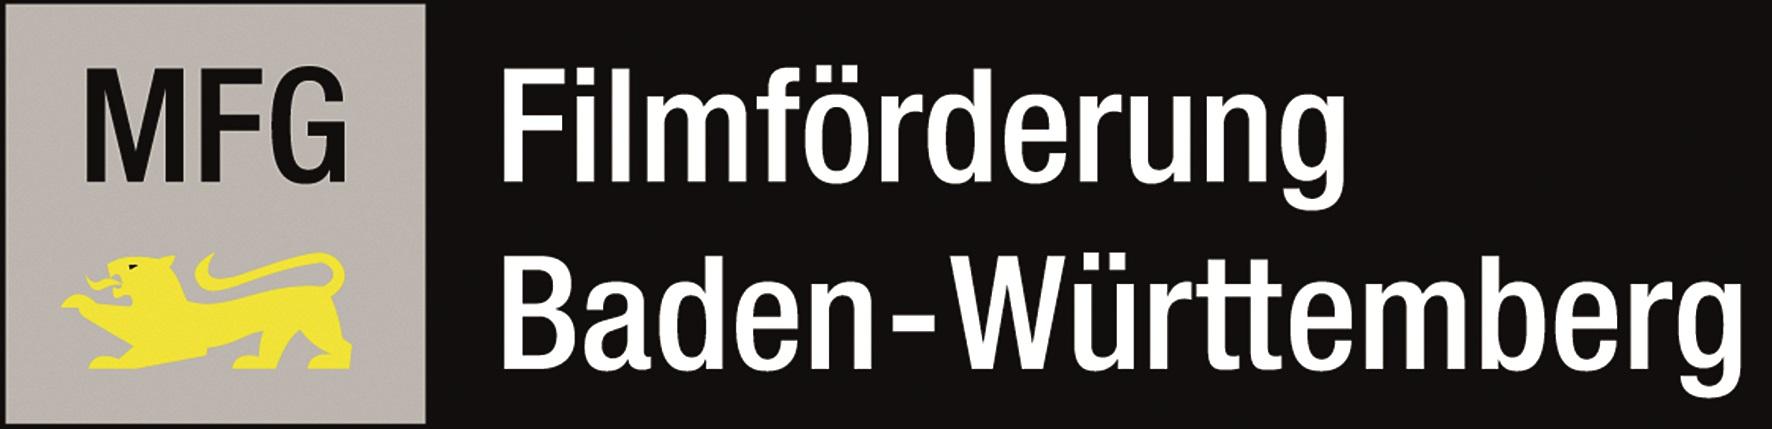 MFG Medien- & Filmgesellschaft Baden-Württemberg